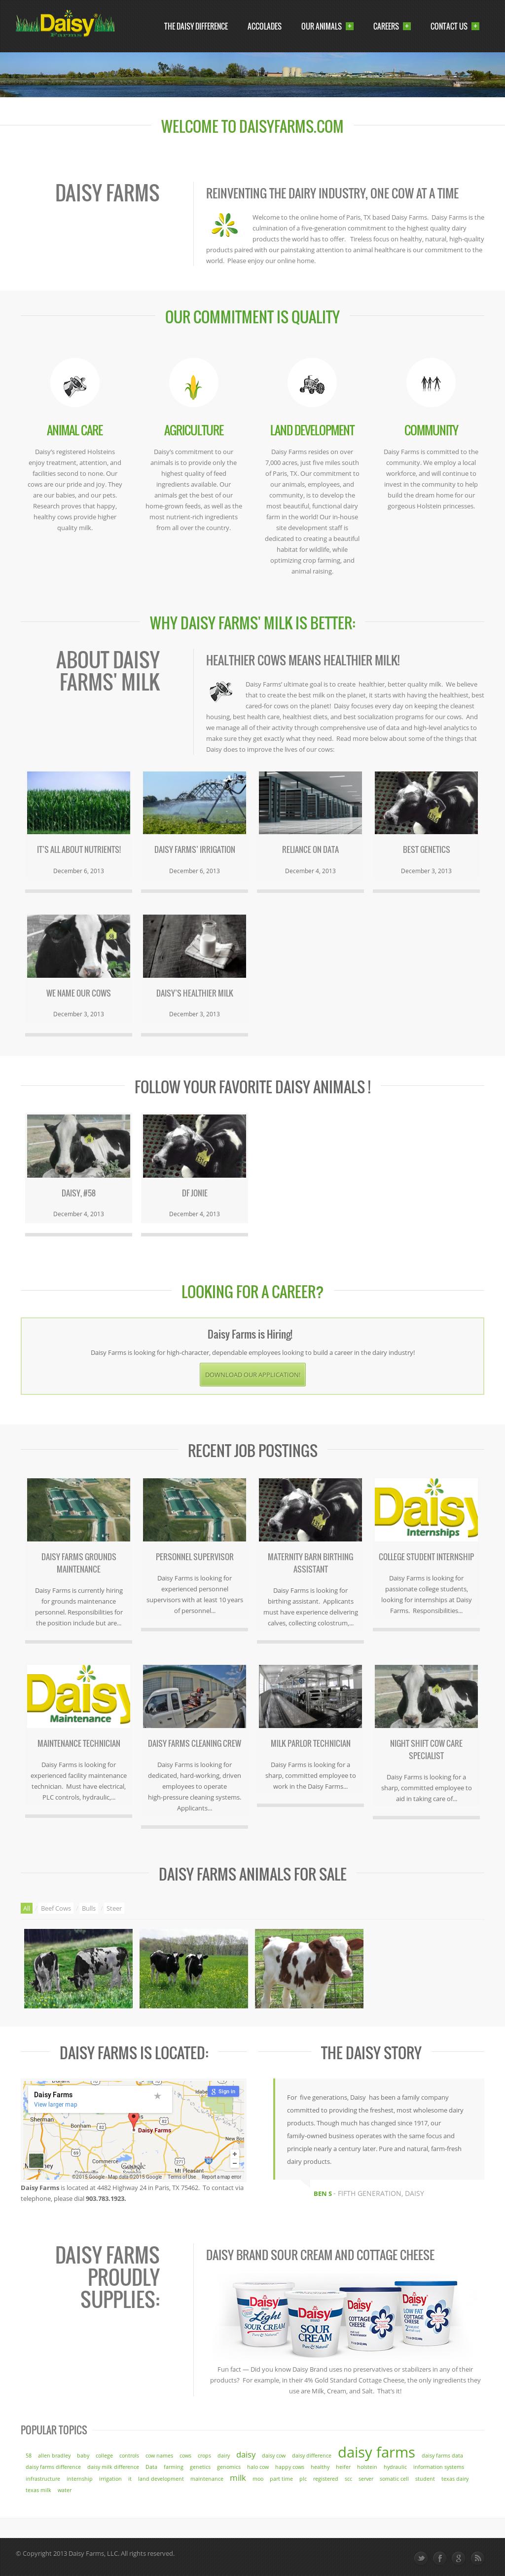 Daisy Farms Competitors, Revenue and Employees - Owler Company Profile